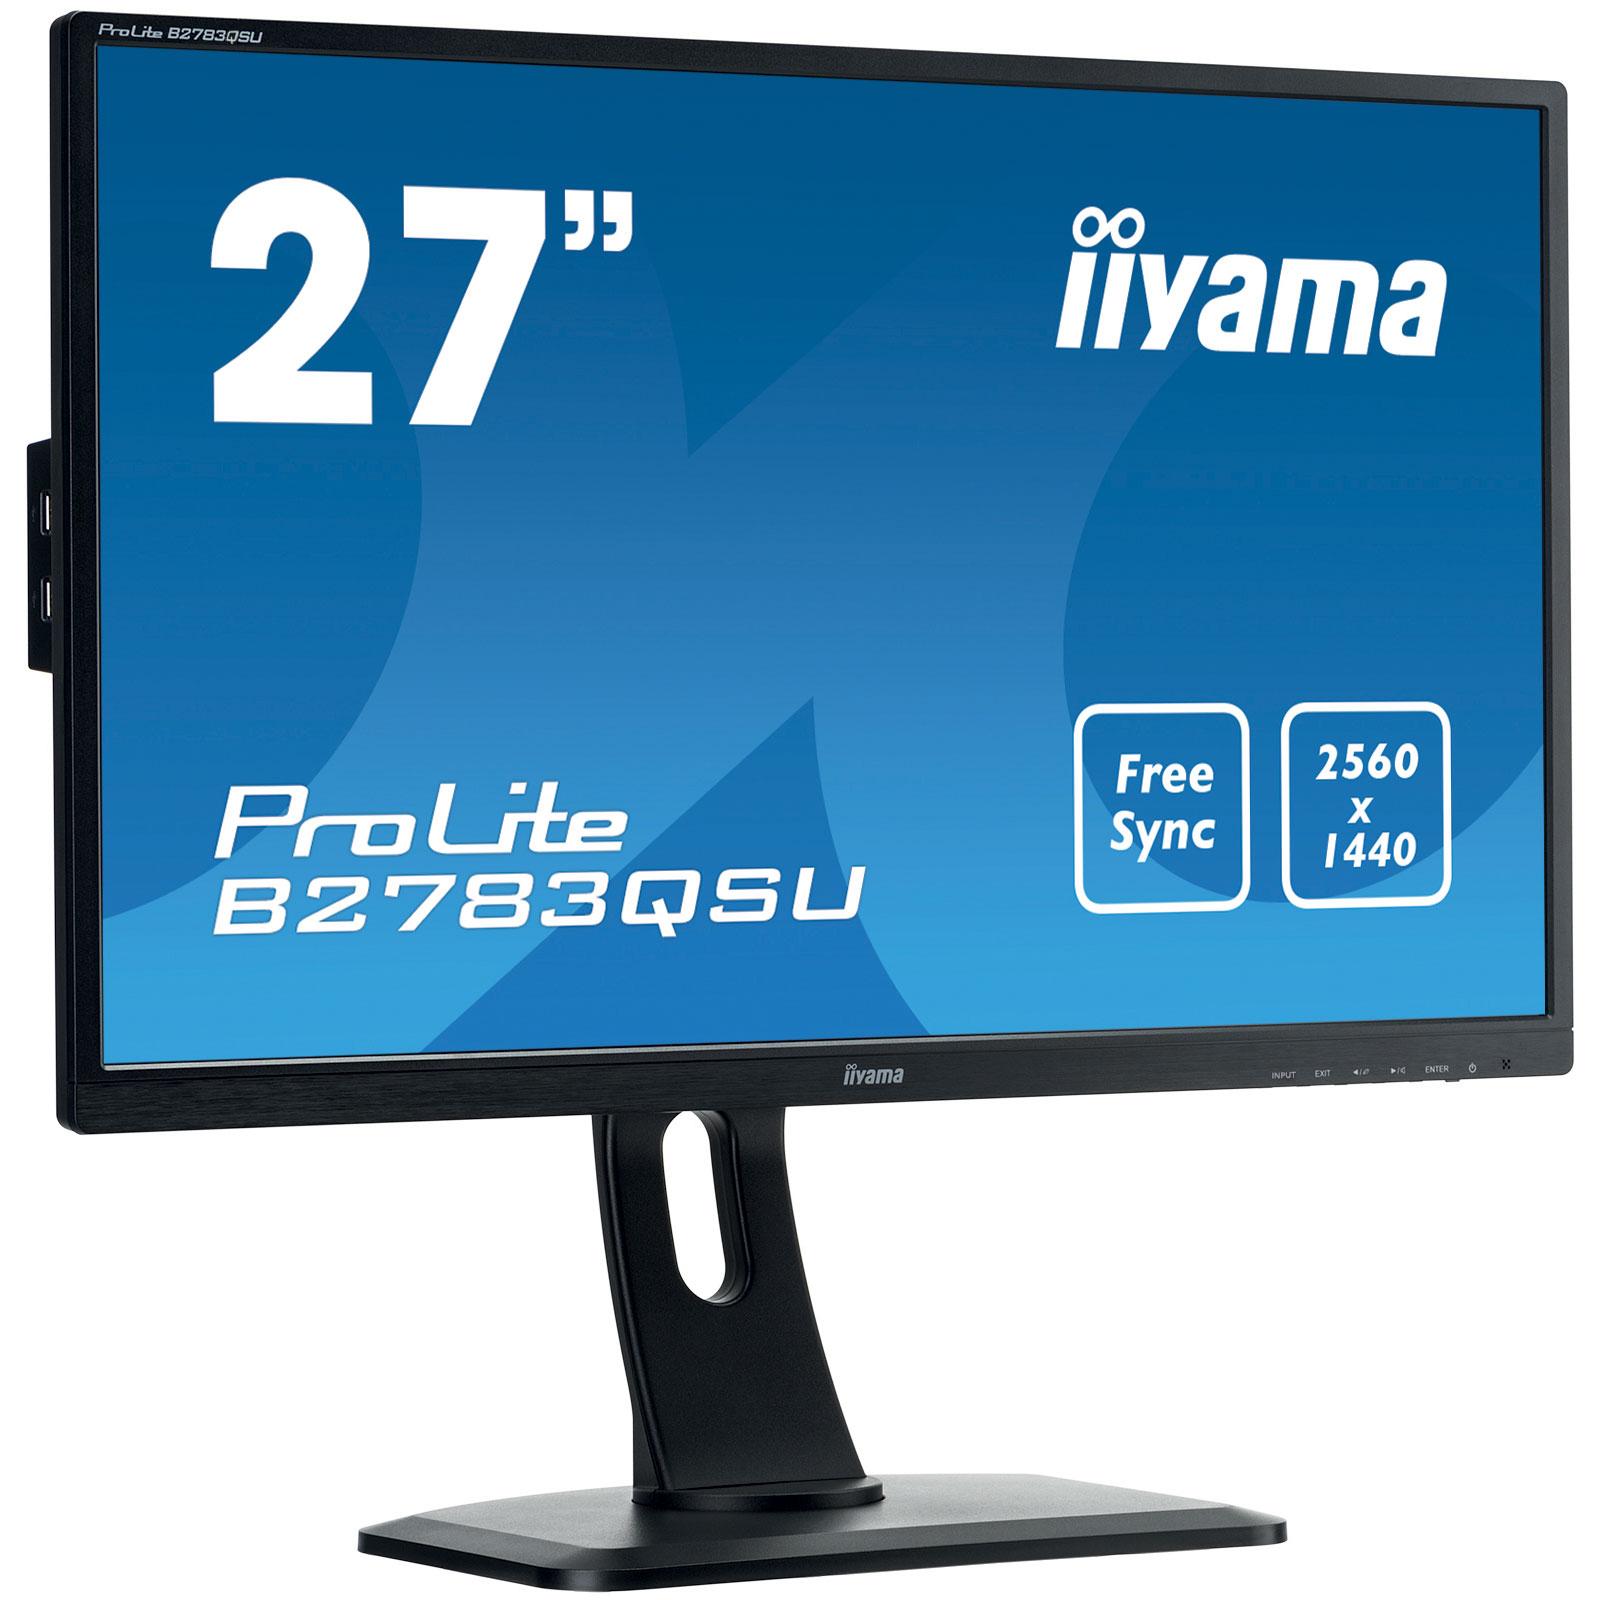 Iiyama 27 led prolite b2783qsu b1 ecran pc iiyama sur for Ecran pc son